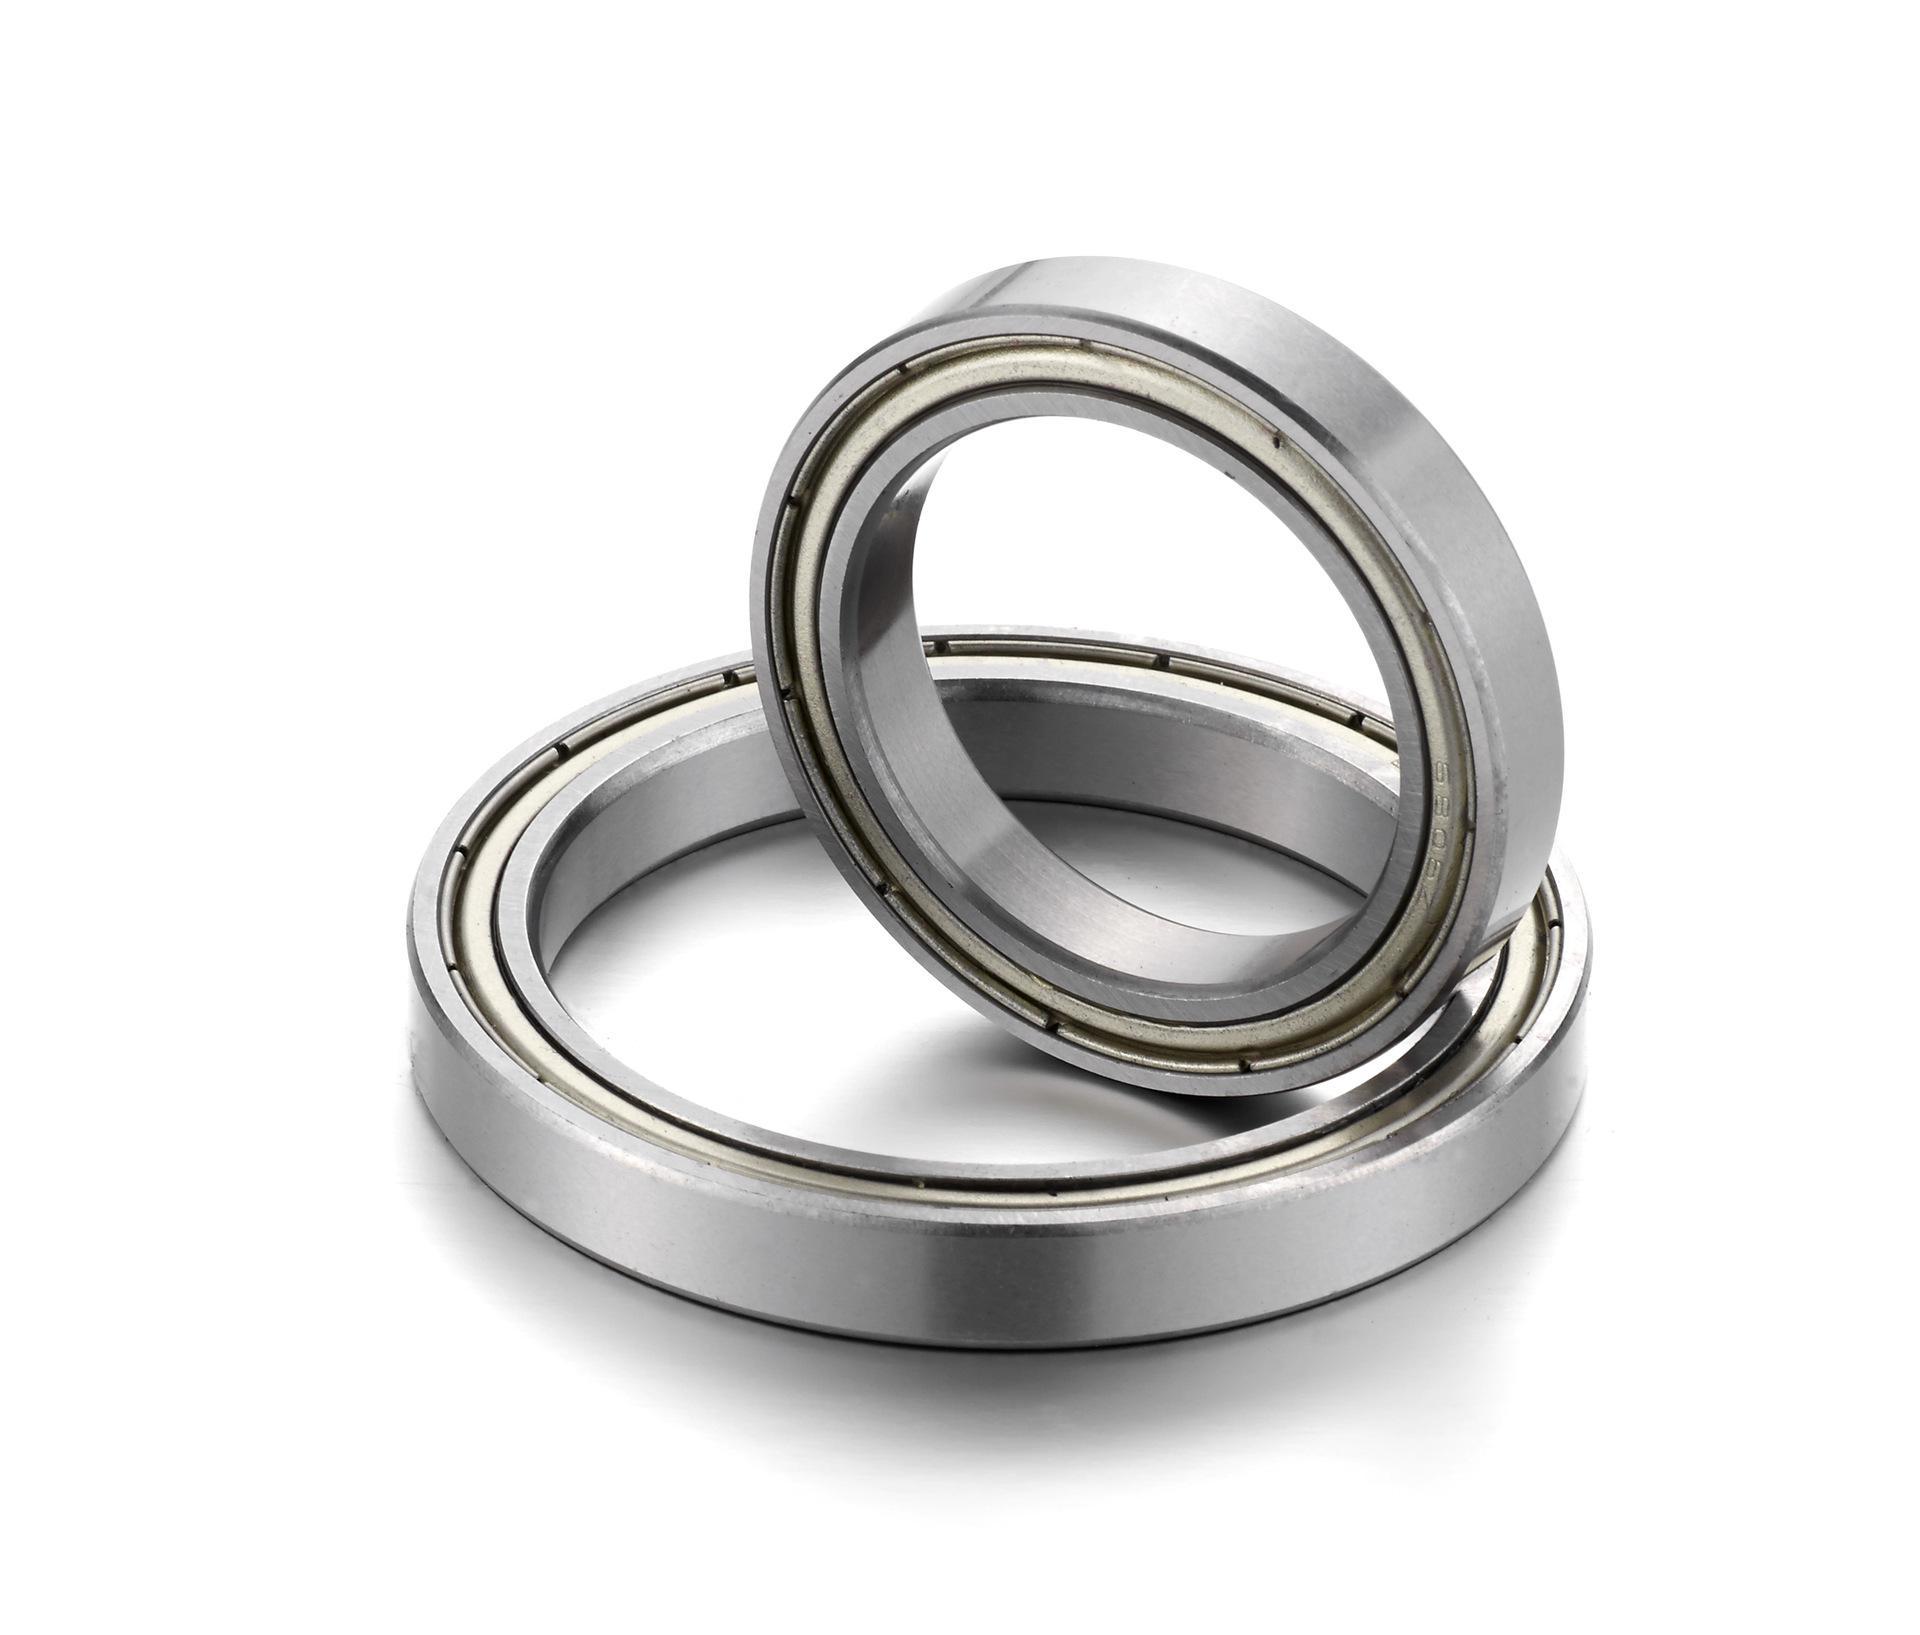 6909 ZZ ABEC-1 (5PCS)  45x68x12MM  Metric Thin Section Bearings 61909Z 6909ZZ 1pcs 71901 71901cd p4 7901 12x24x6 mochu thin walled miniature angular contact bearings speed spindle bearings cnc abec 7